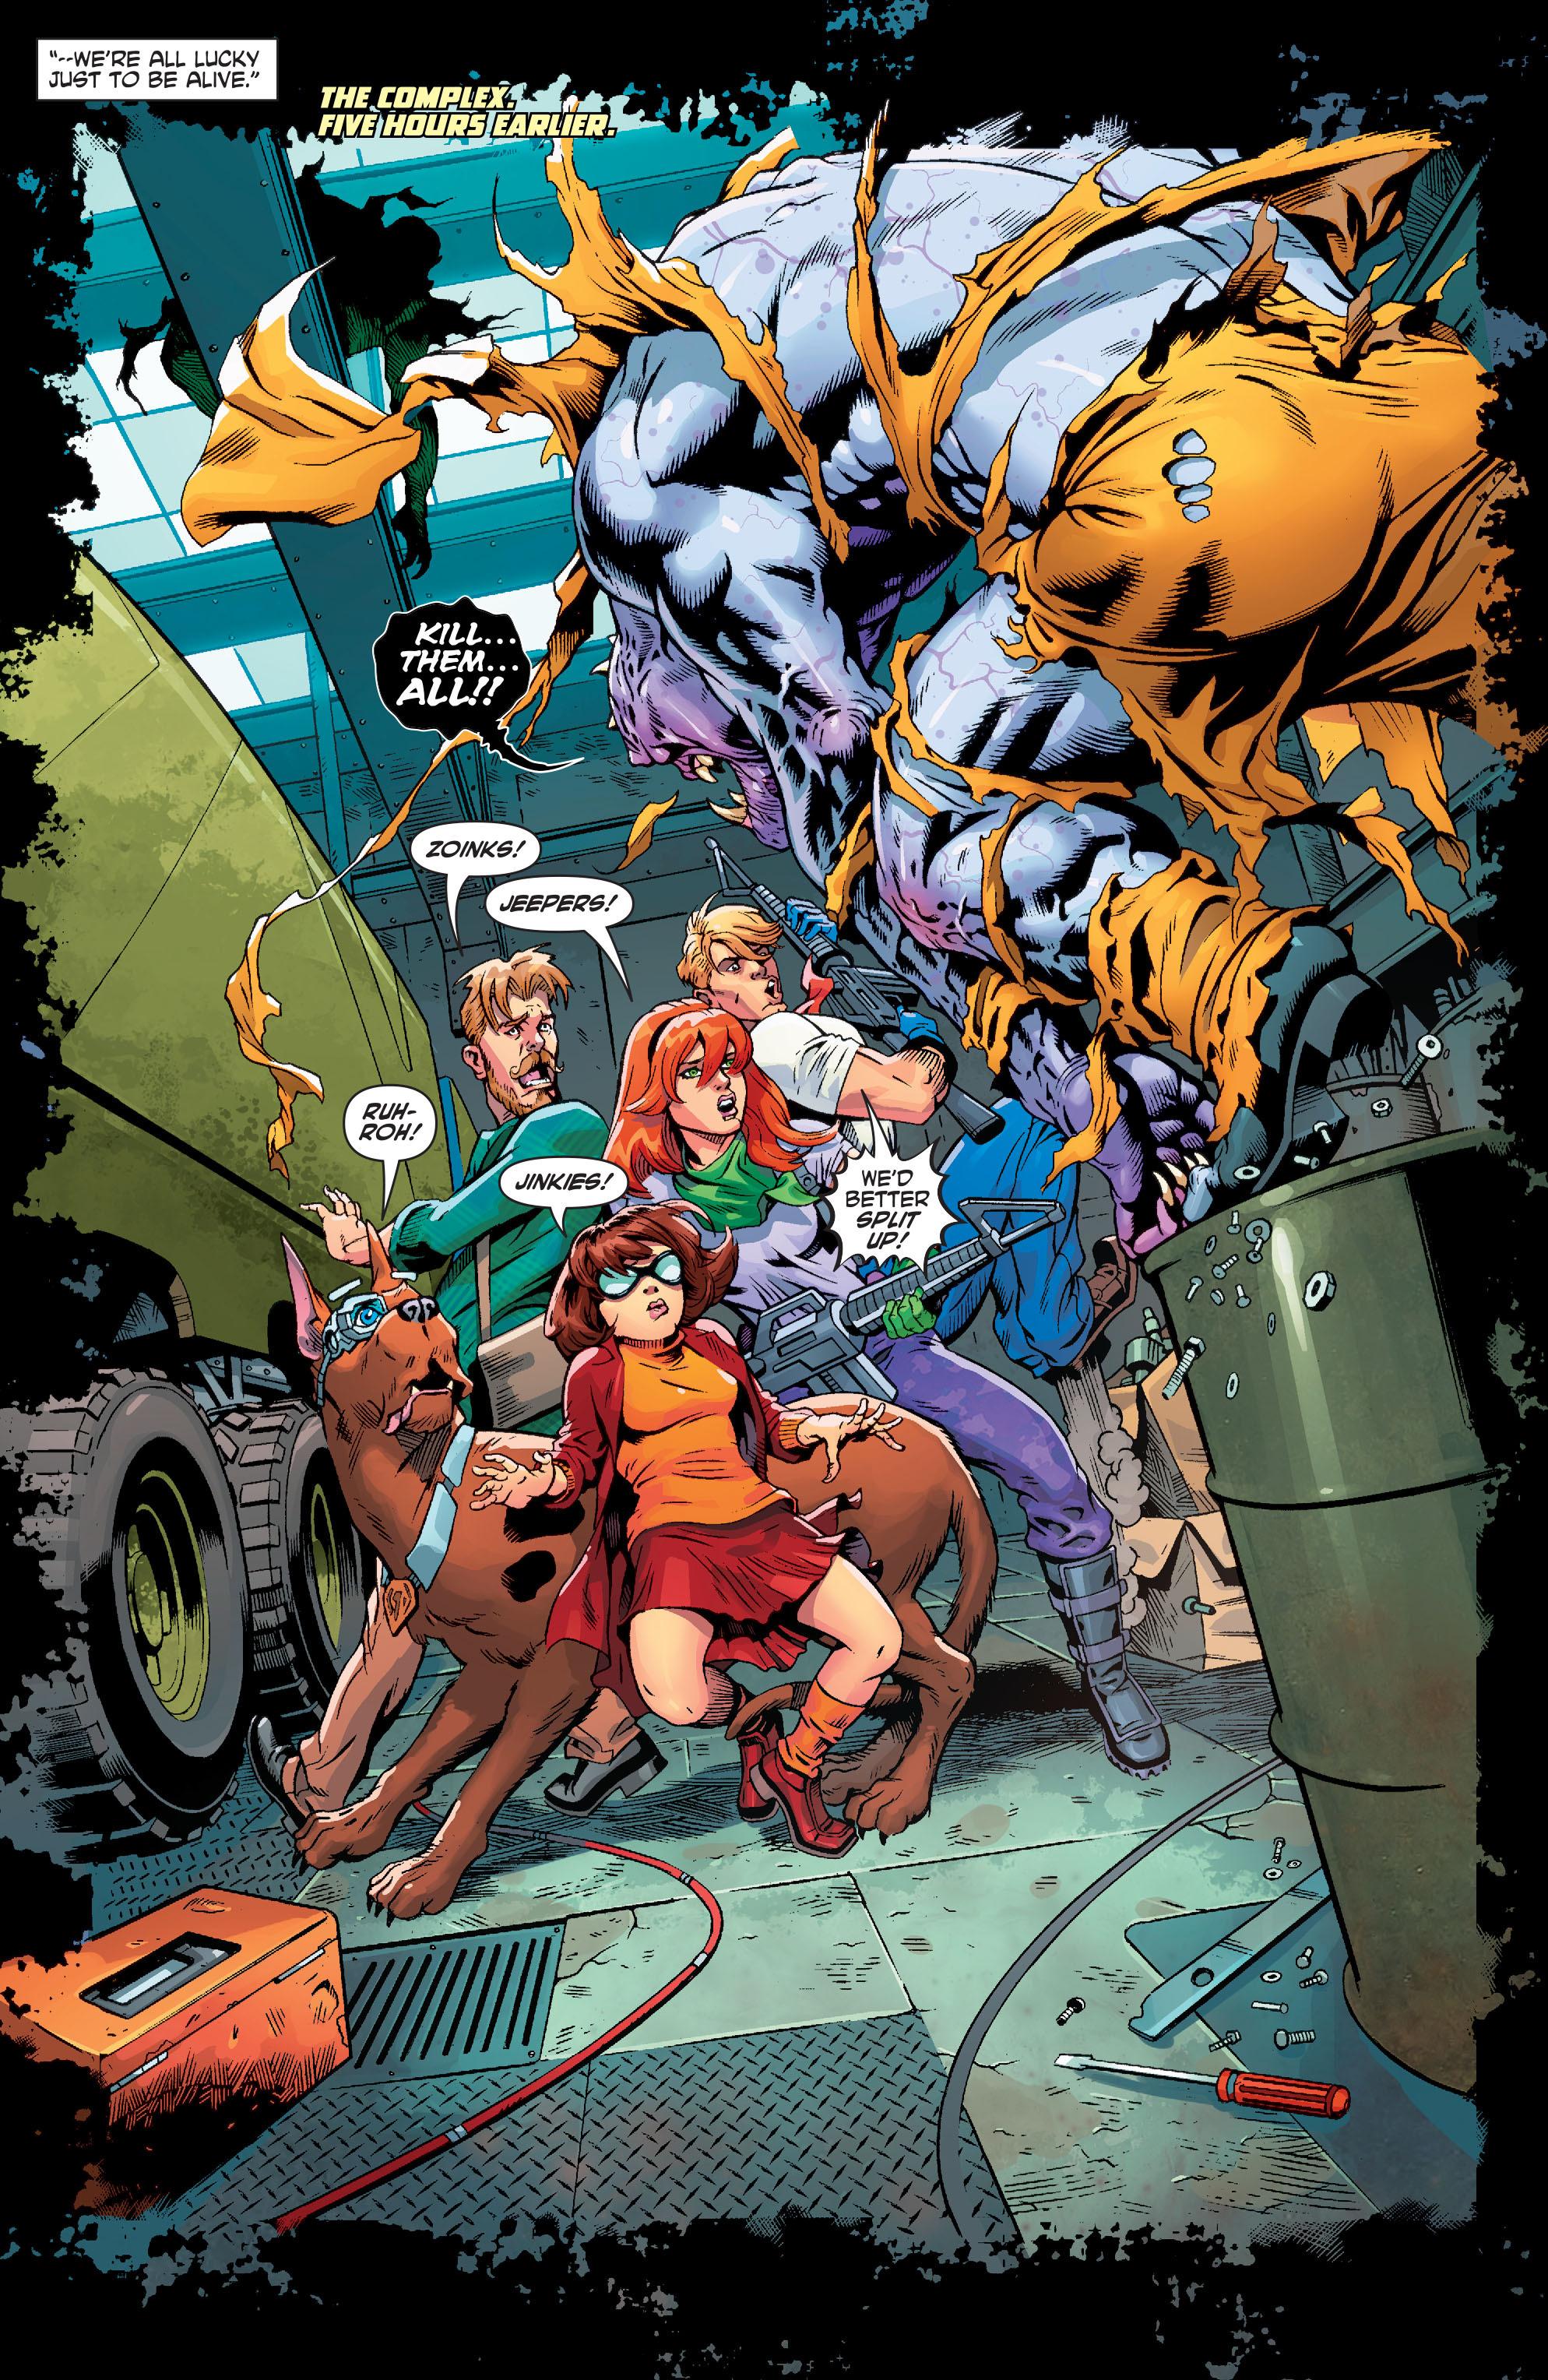 Read online Scooby Apocalypse comic -  Issue #3 - 7